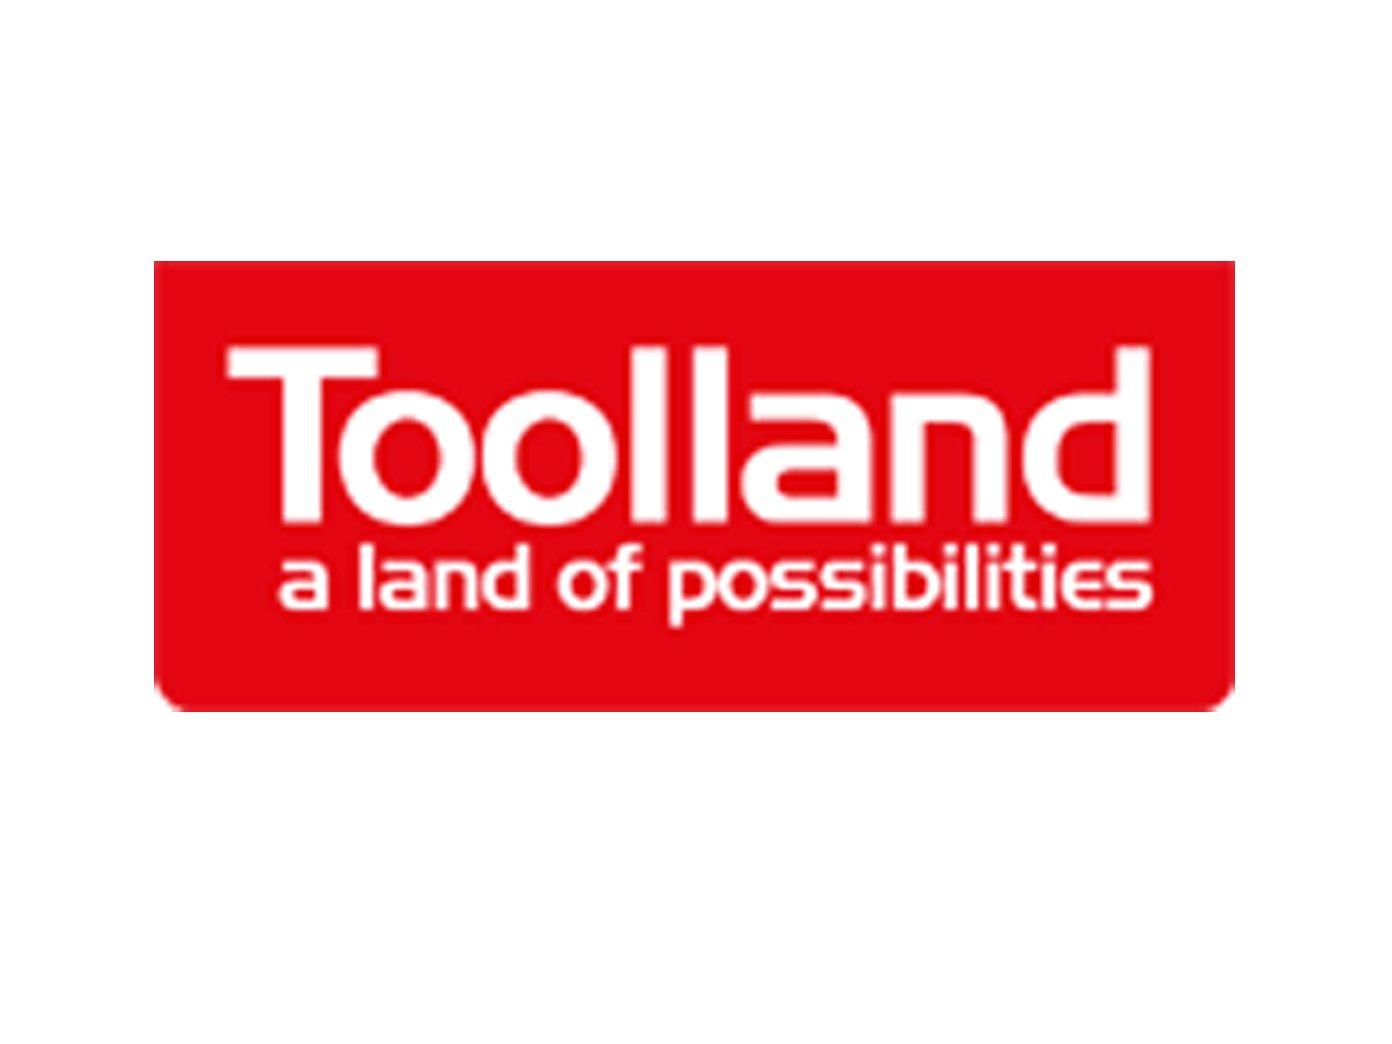 Chauffage De Toolland Kw Construction3 Tc78074 7ybf6Yg